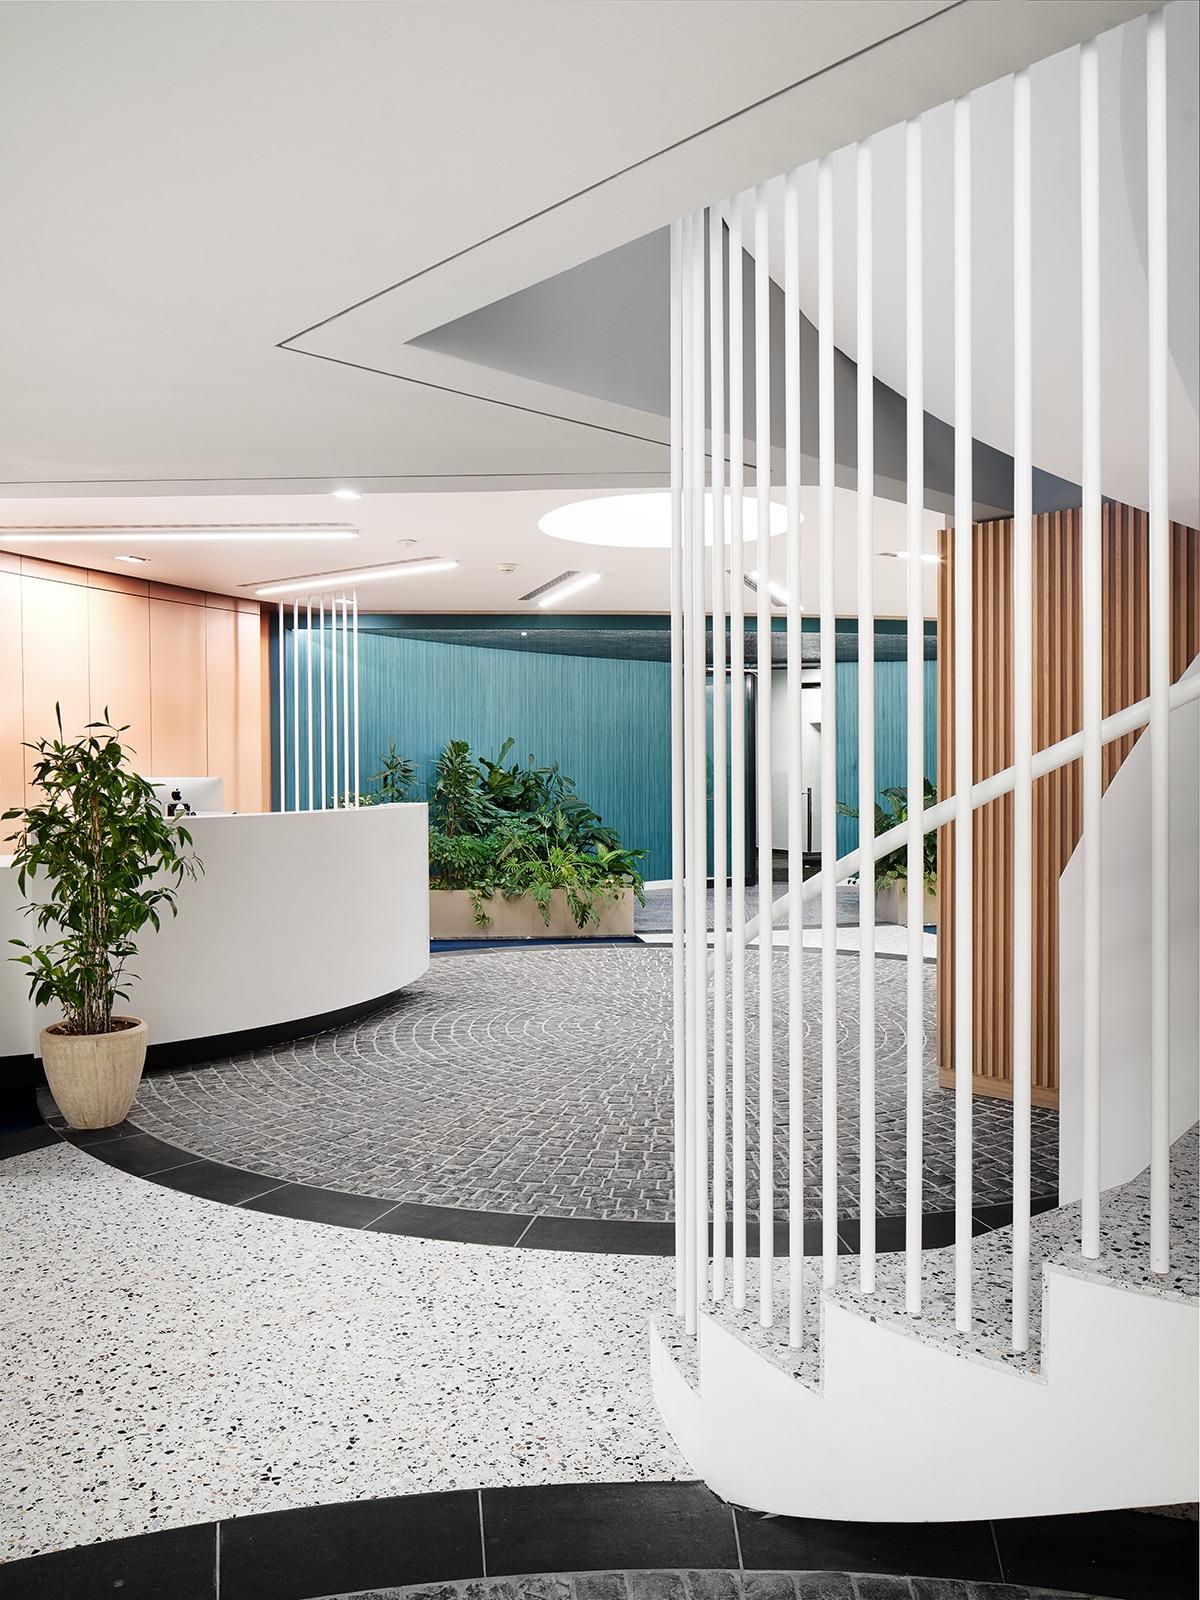 roman-klis-design-office-17